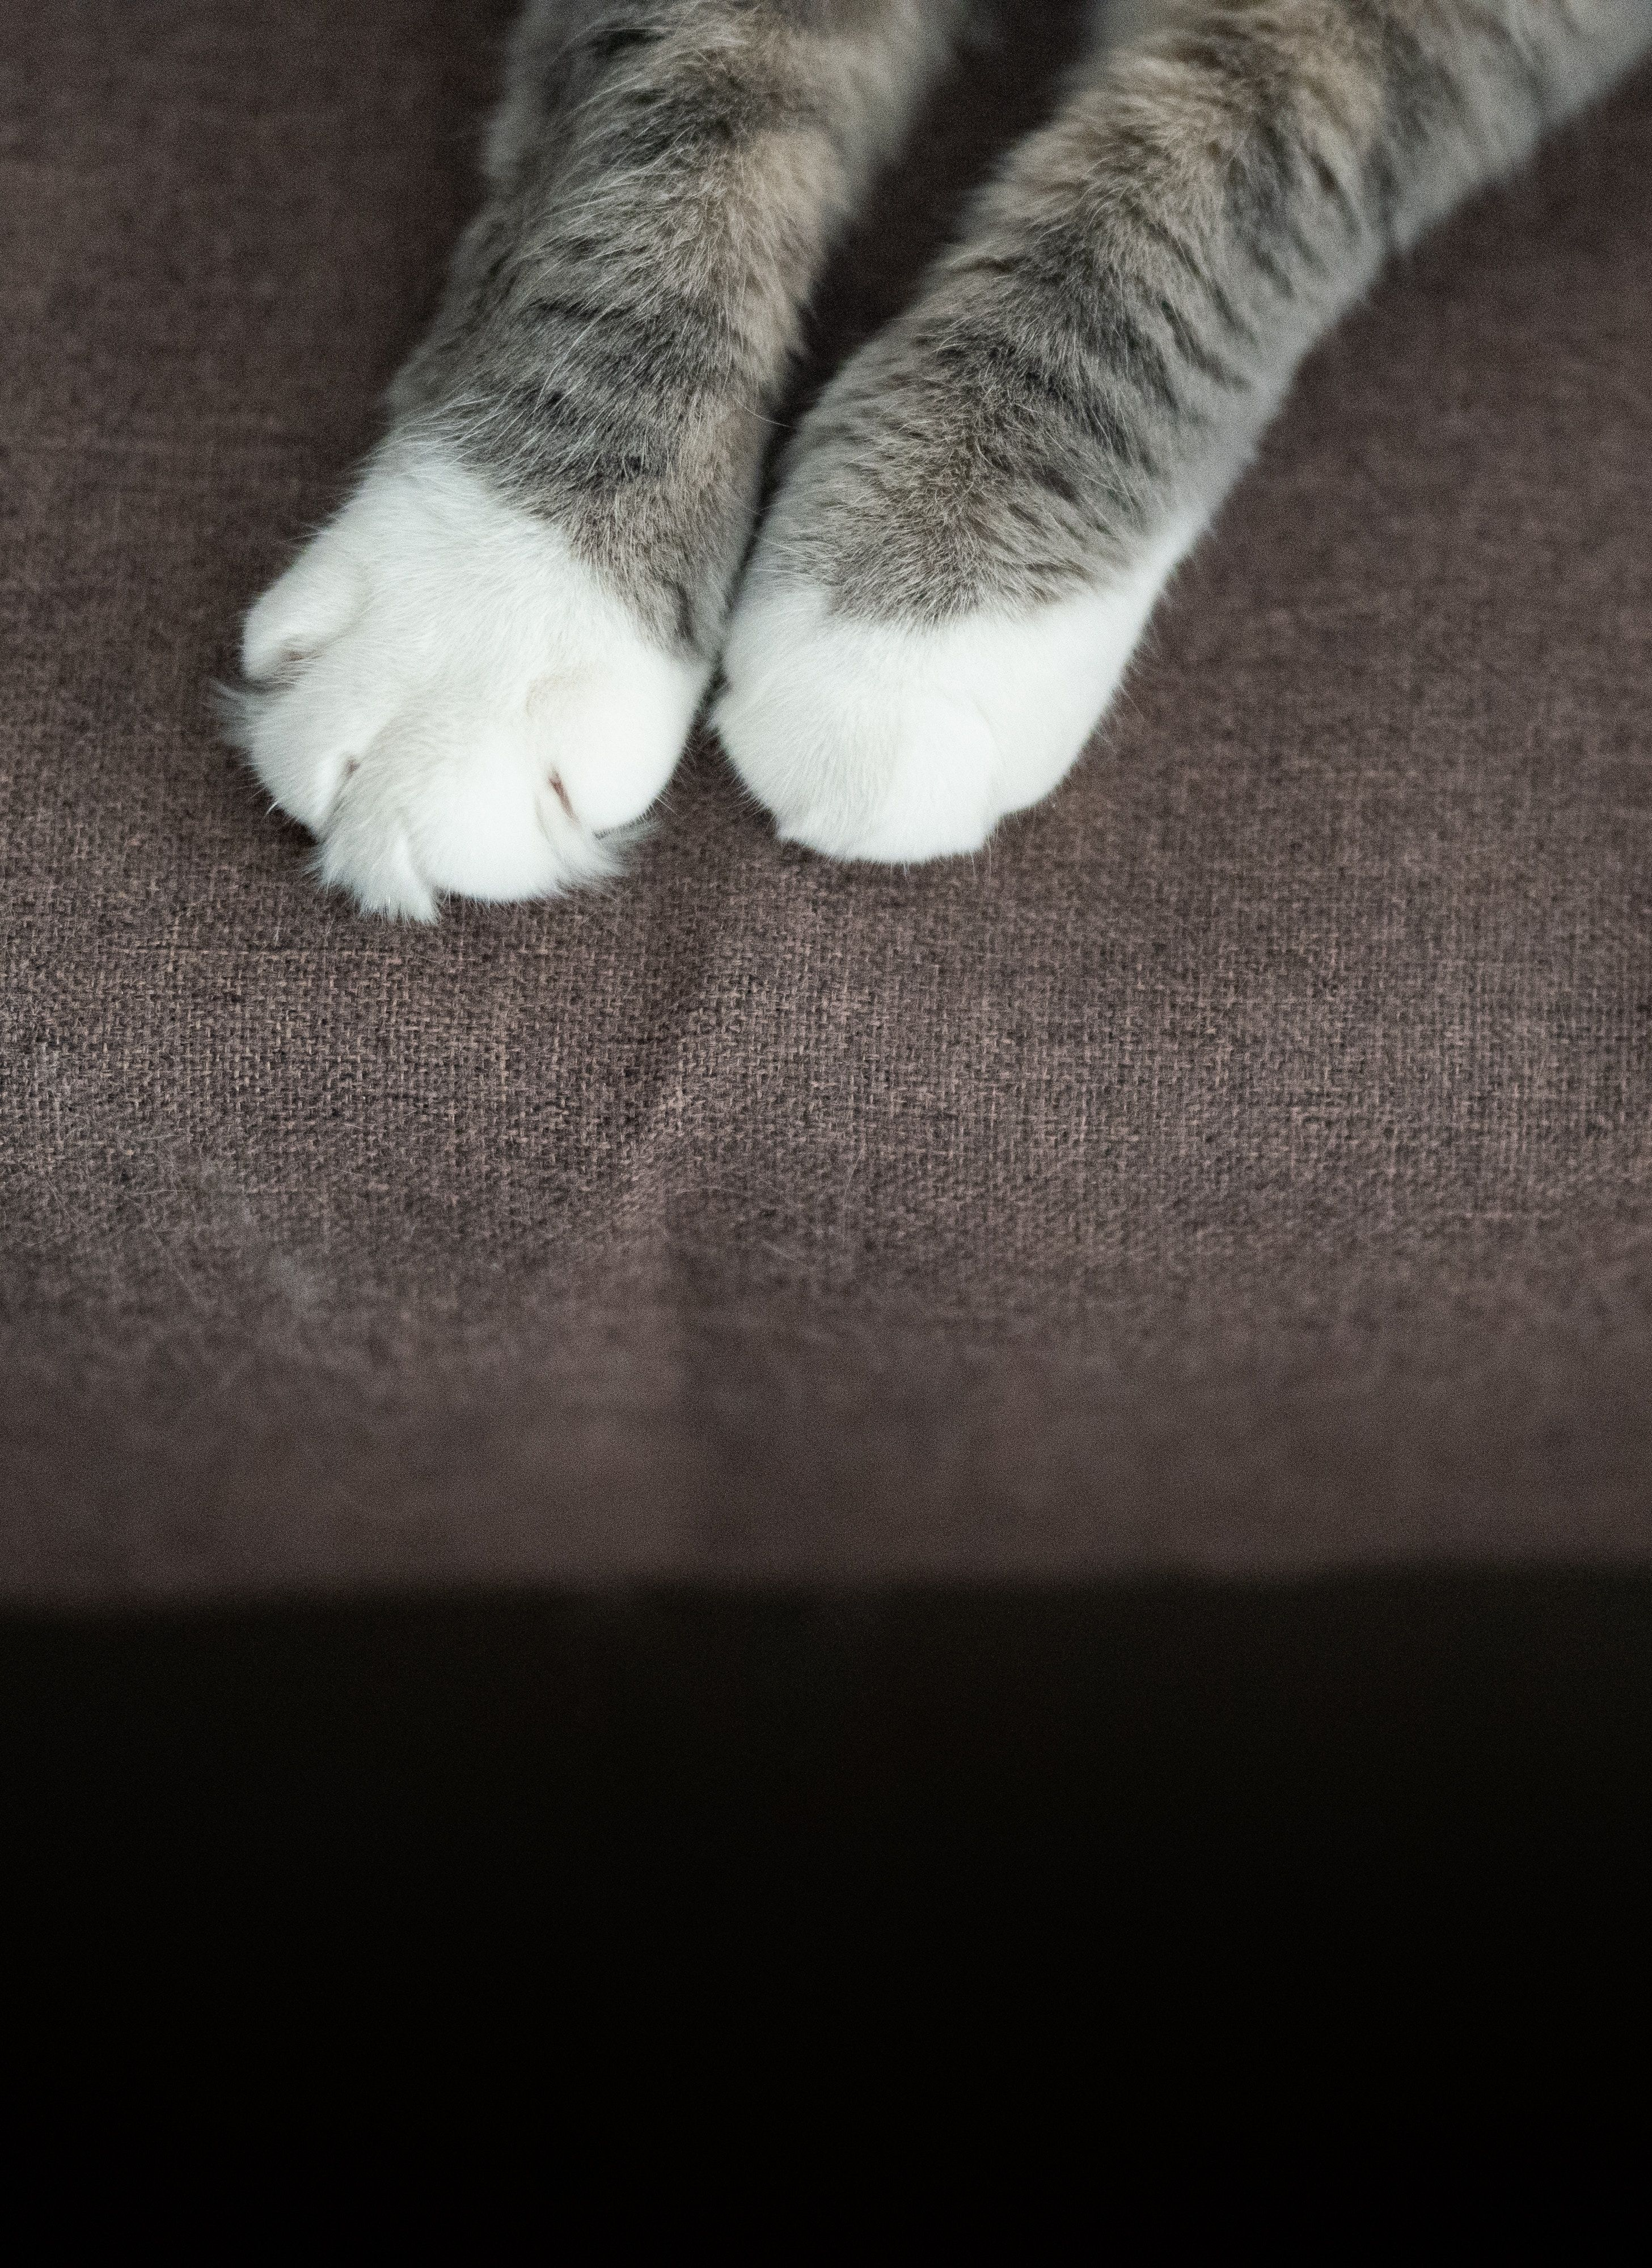 Sony Ilce 7m3 Eef2f0 Cat Diseases Cat Health Cat Health Problems